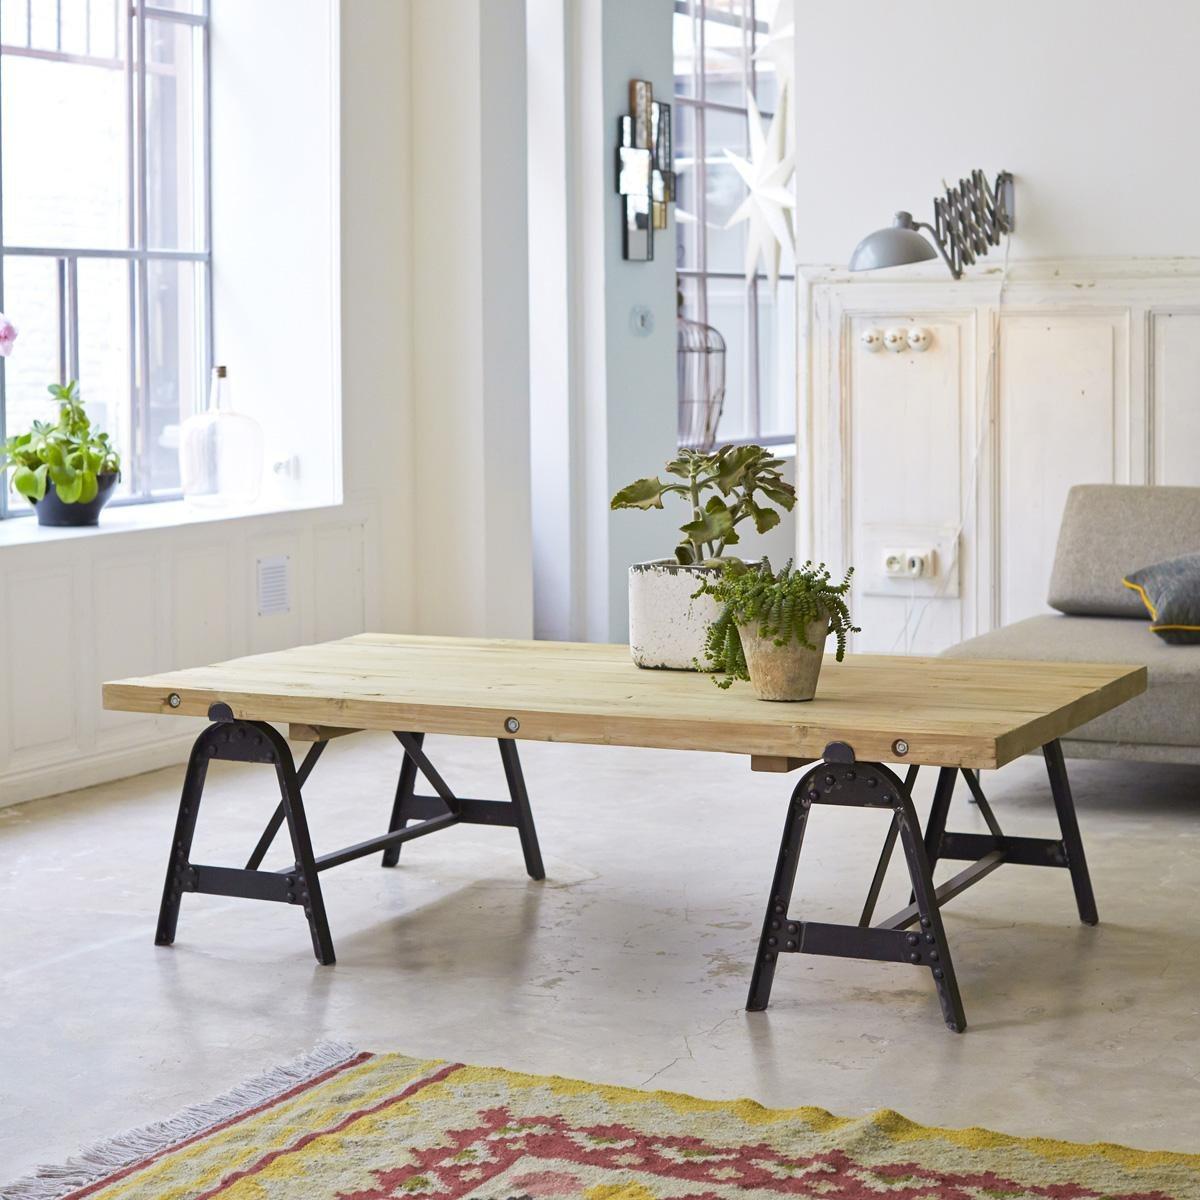 table basse eliot tikamoon en m tal et pin table basse la redoute. Black Bedroom Furniture Sets. Home Design Ideas